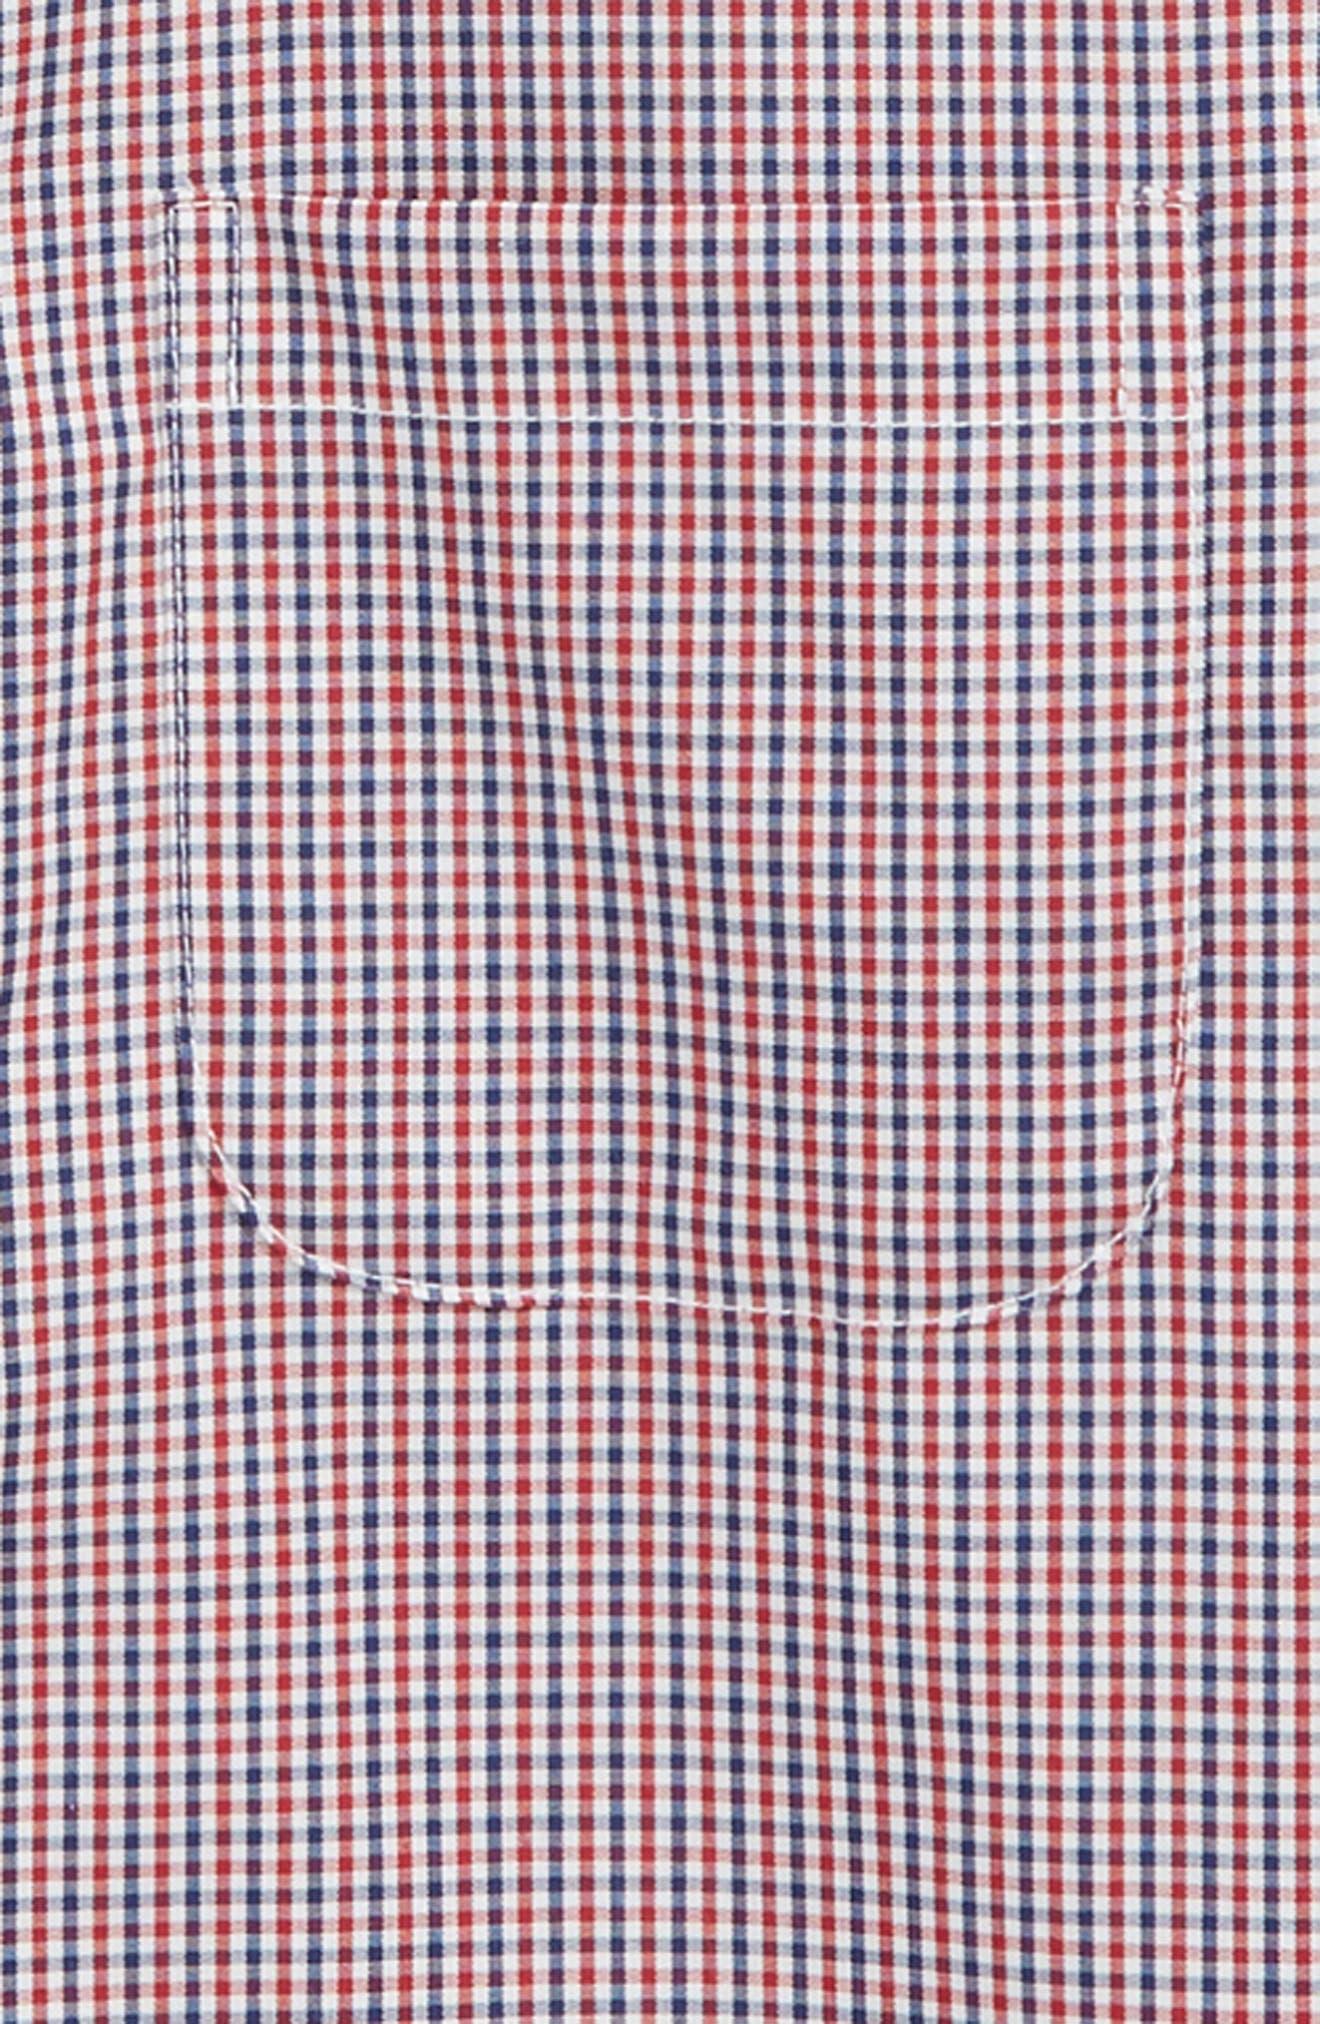 Non-Iron Check Dress Shirt,                             Alternate thumbnail 2, color,                             RED SAGE- NAVY PLAID